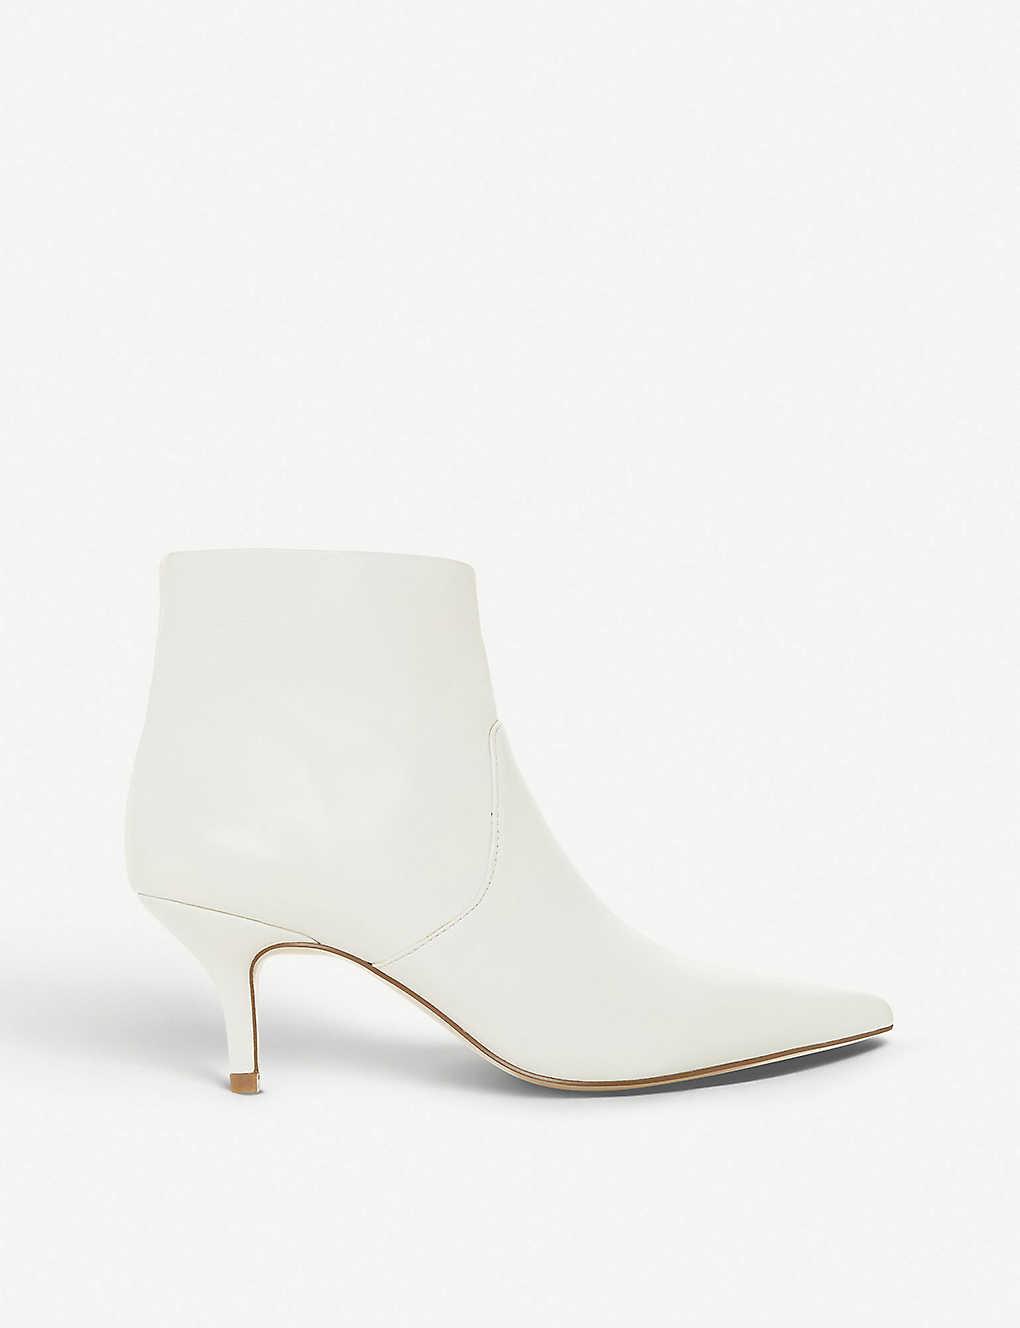 81b62fd7042 STEVE MADDEN - Rome leather heeled ankle boots | Selfridges.com